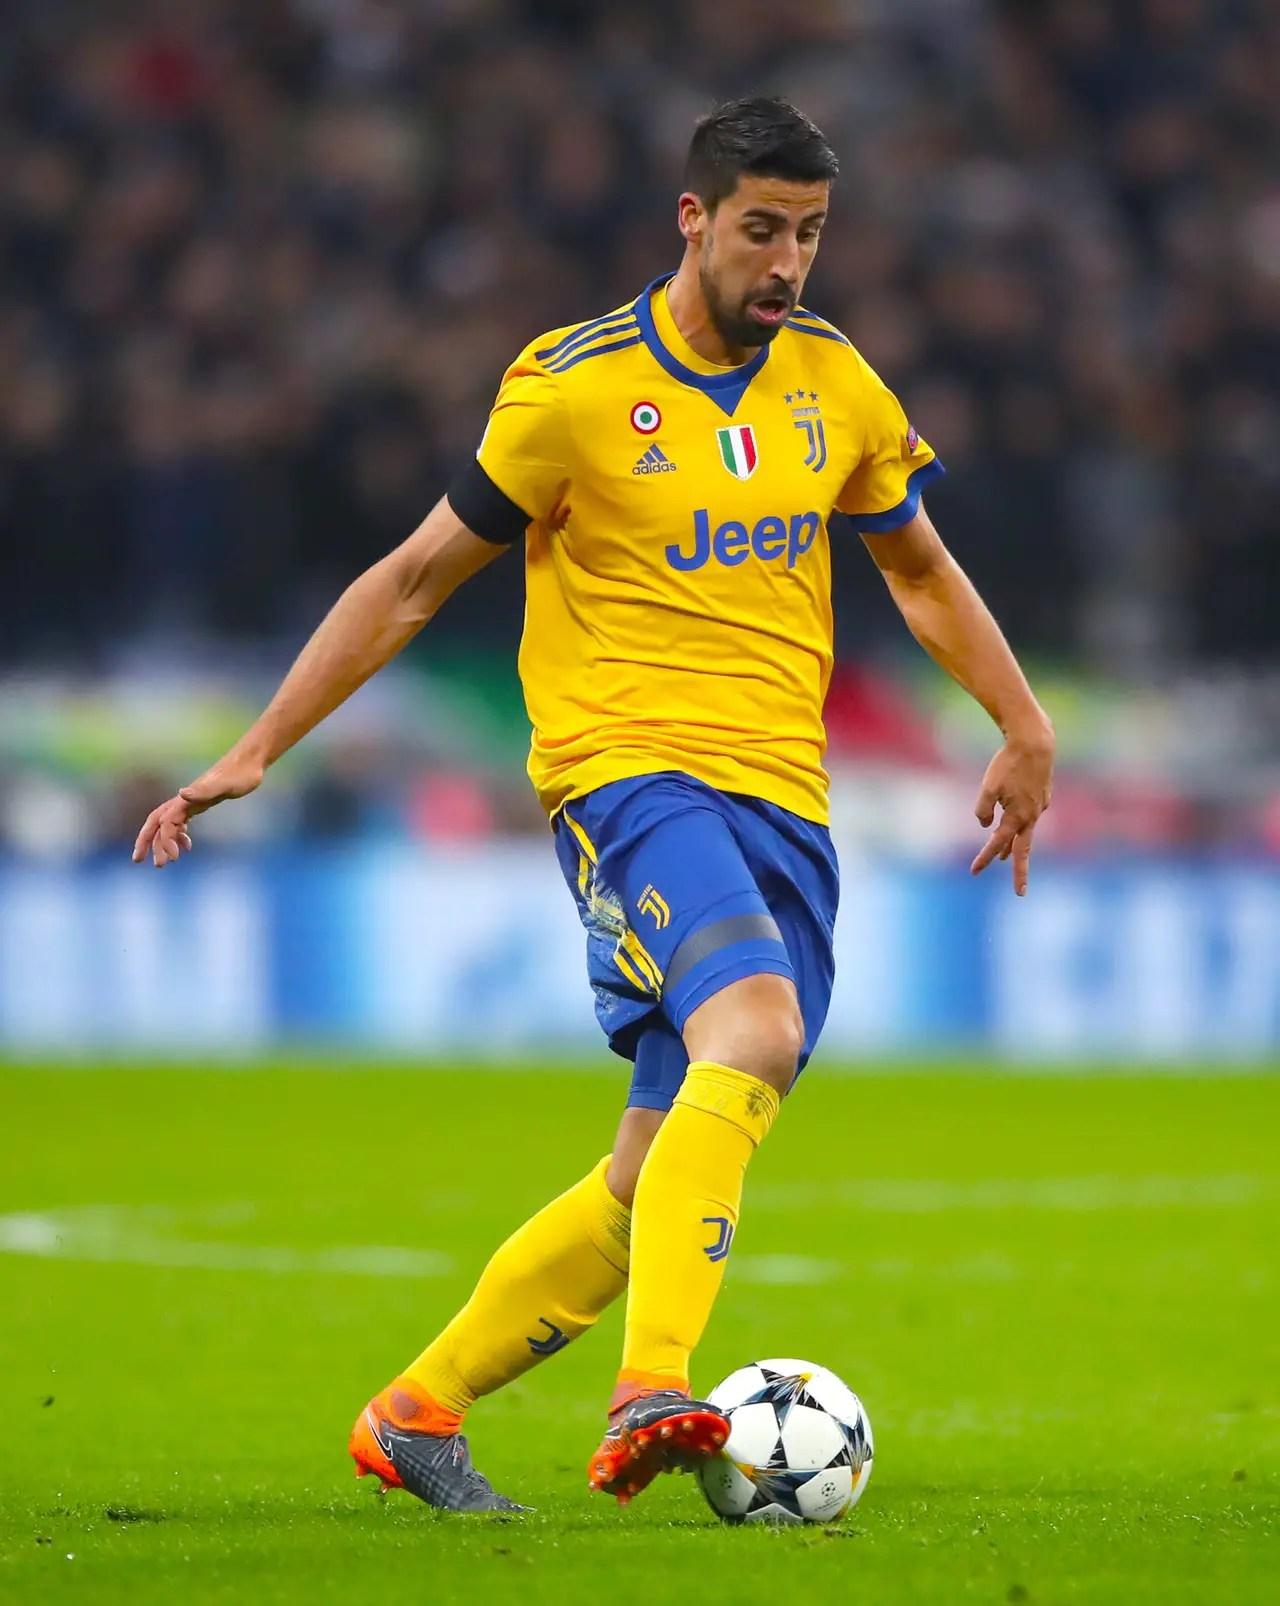 Midfielder Linked With Juventus Exit